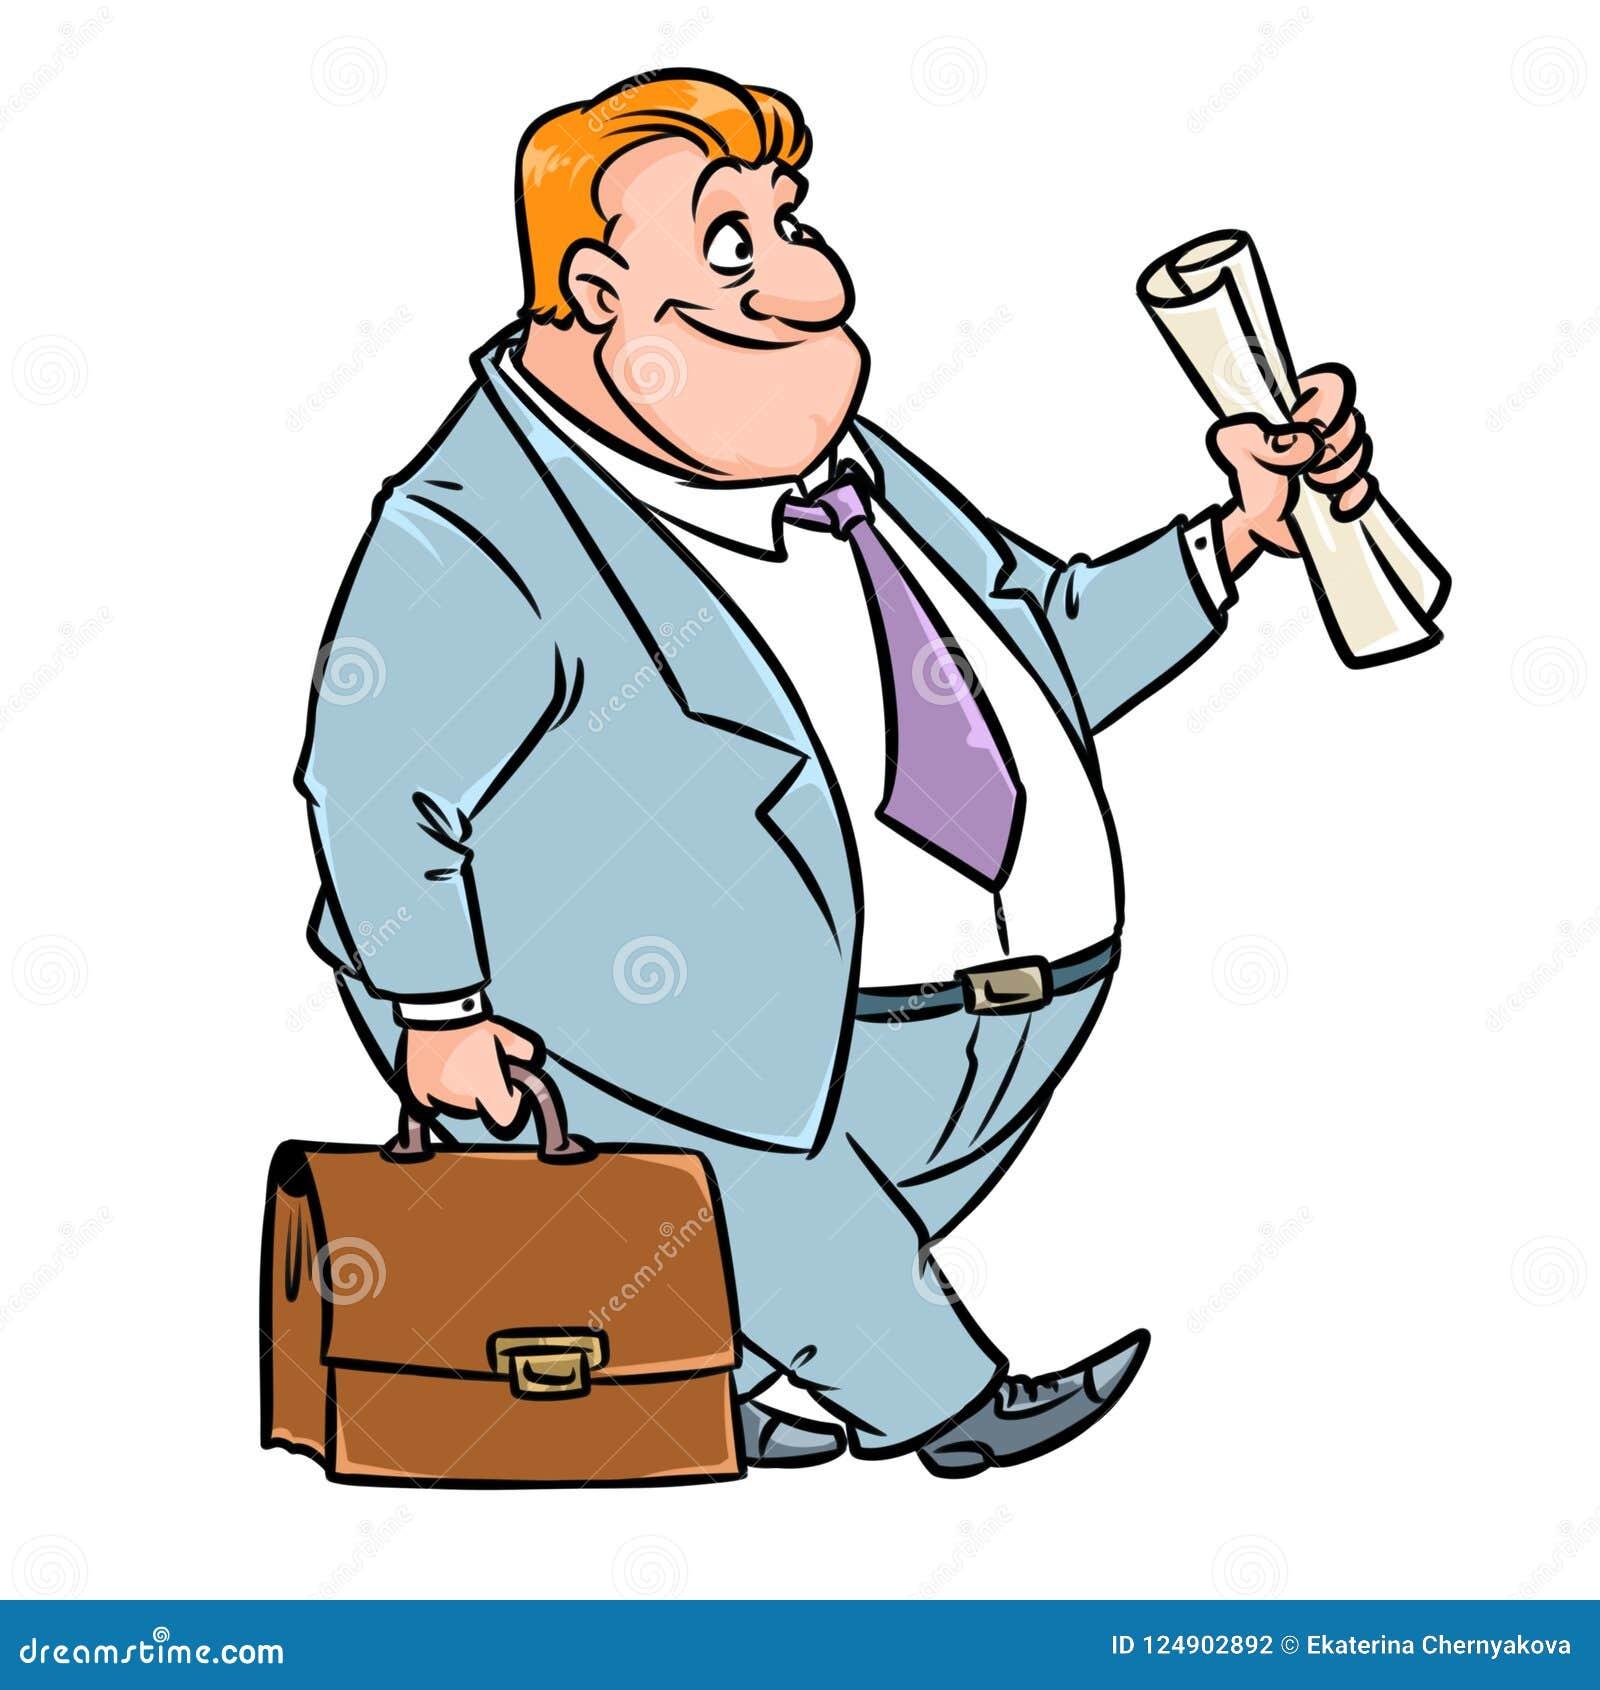 Businessman business suit portfolio suit cartoon